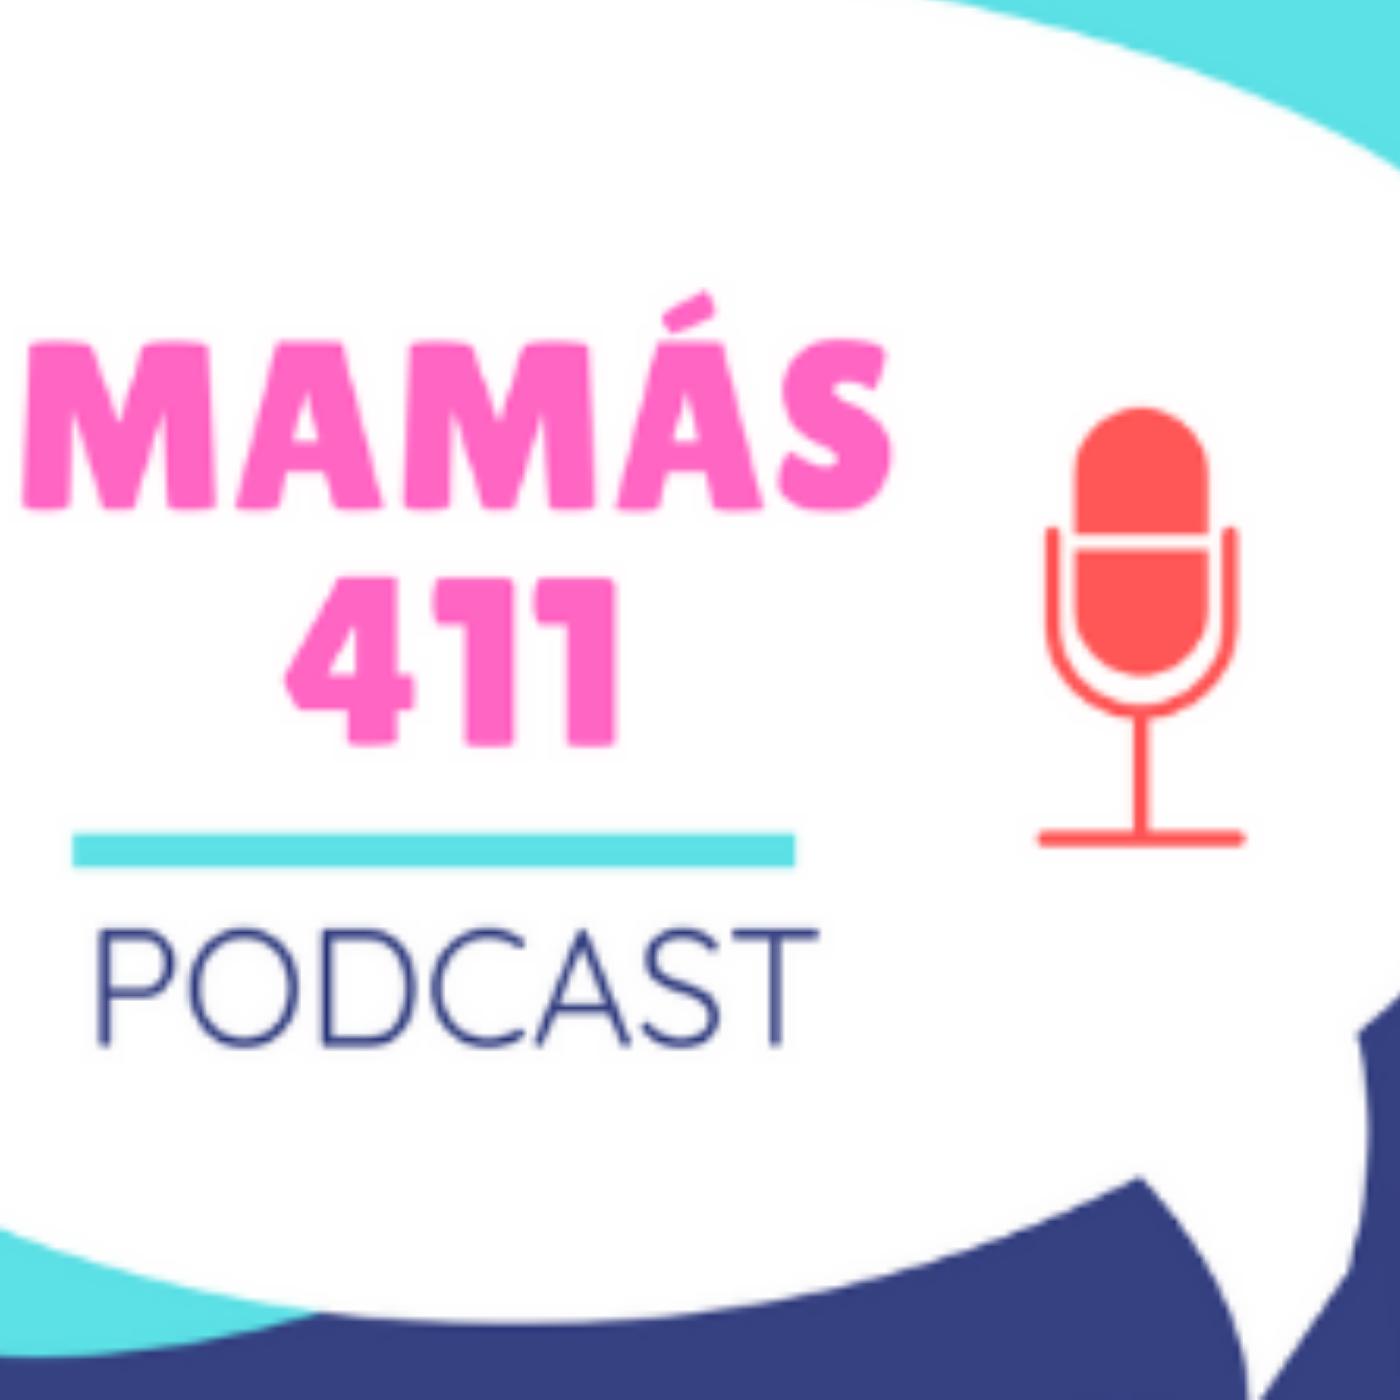 Mamas 411 Podcast